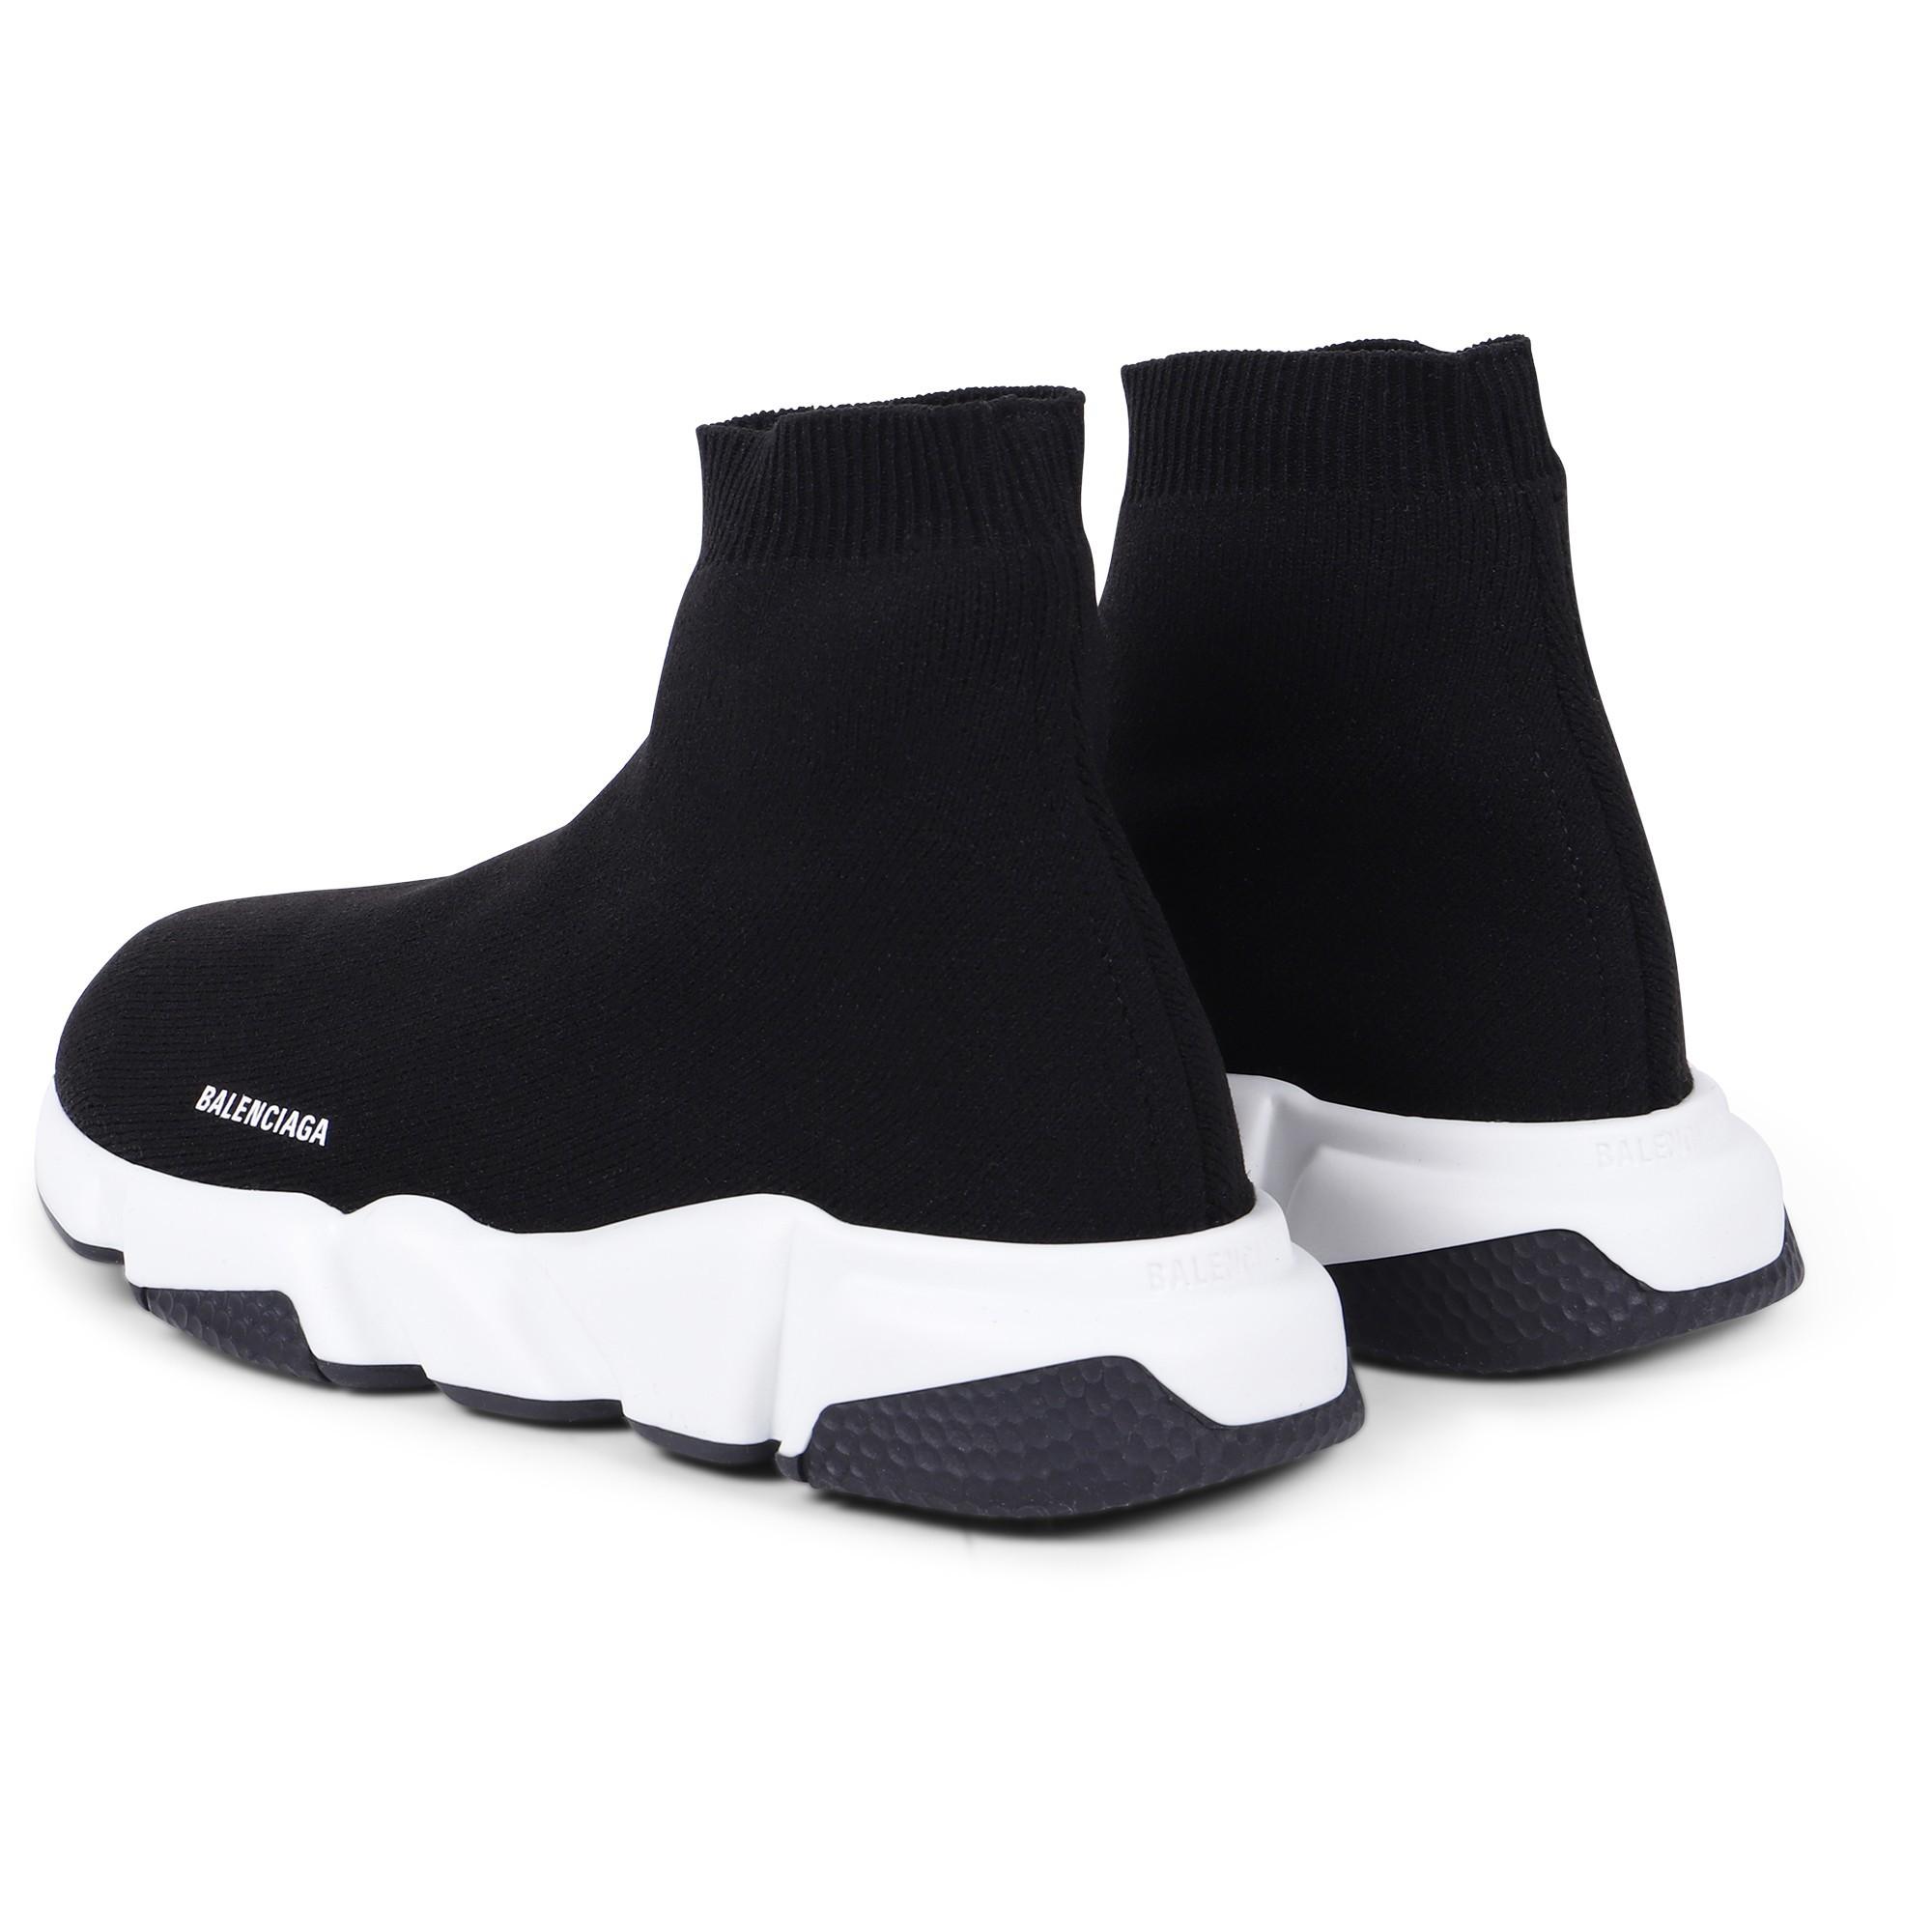 Balenciaga Sock Sneakers in Black